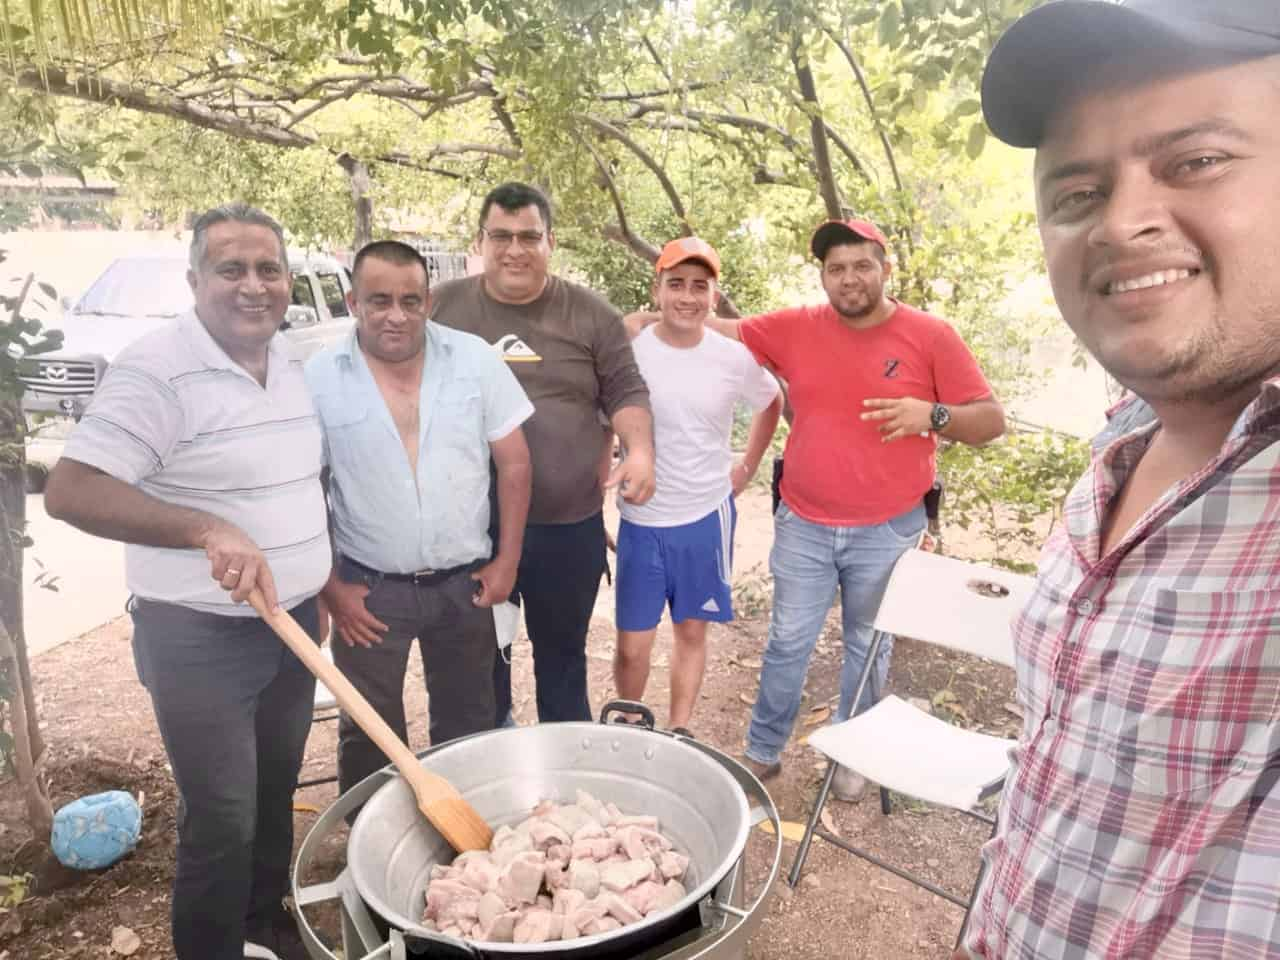 Making chicharrones outdoors in Guatemala.